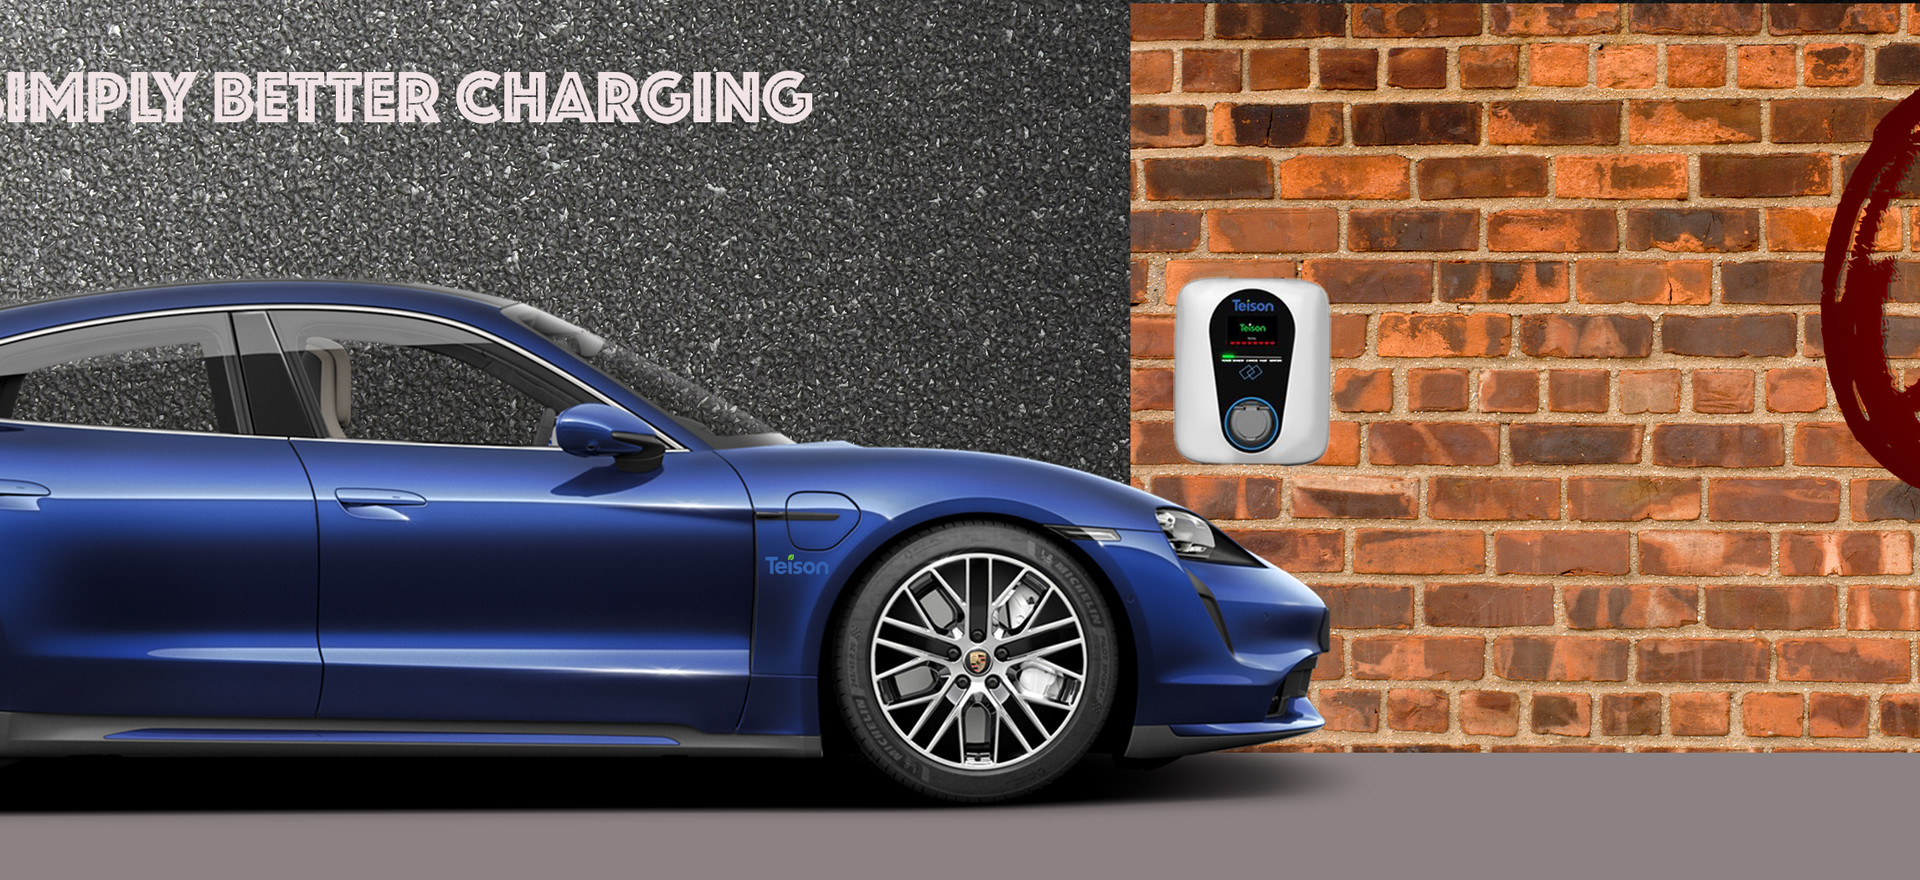 Porsche Taycan EV Home Charging